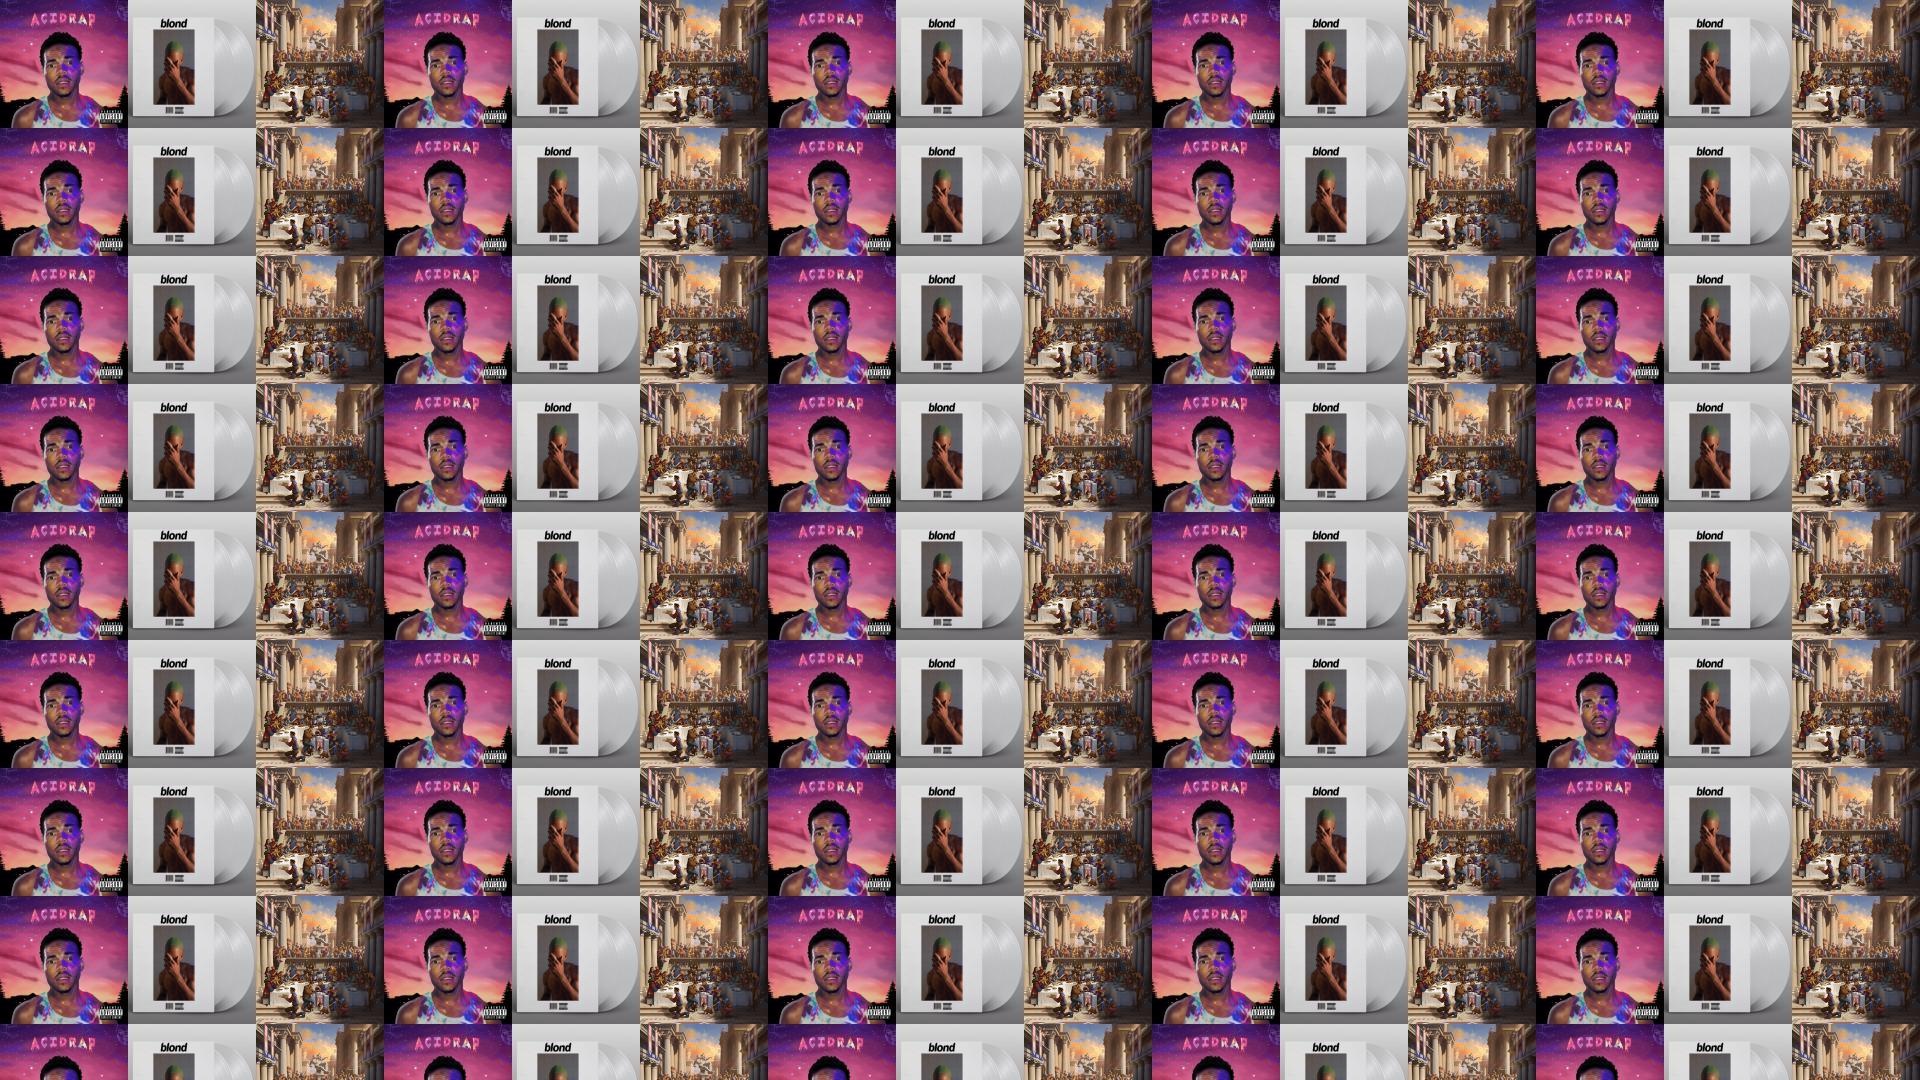 Logic Wallpaper Hd 78 Images